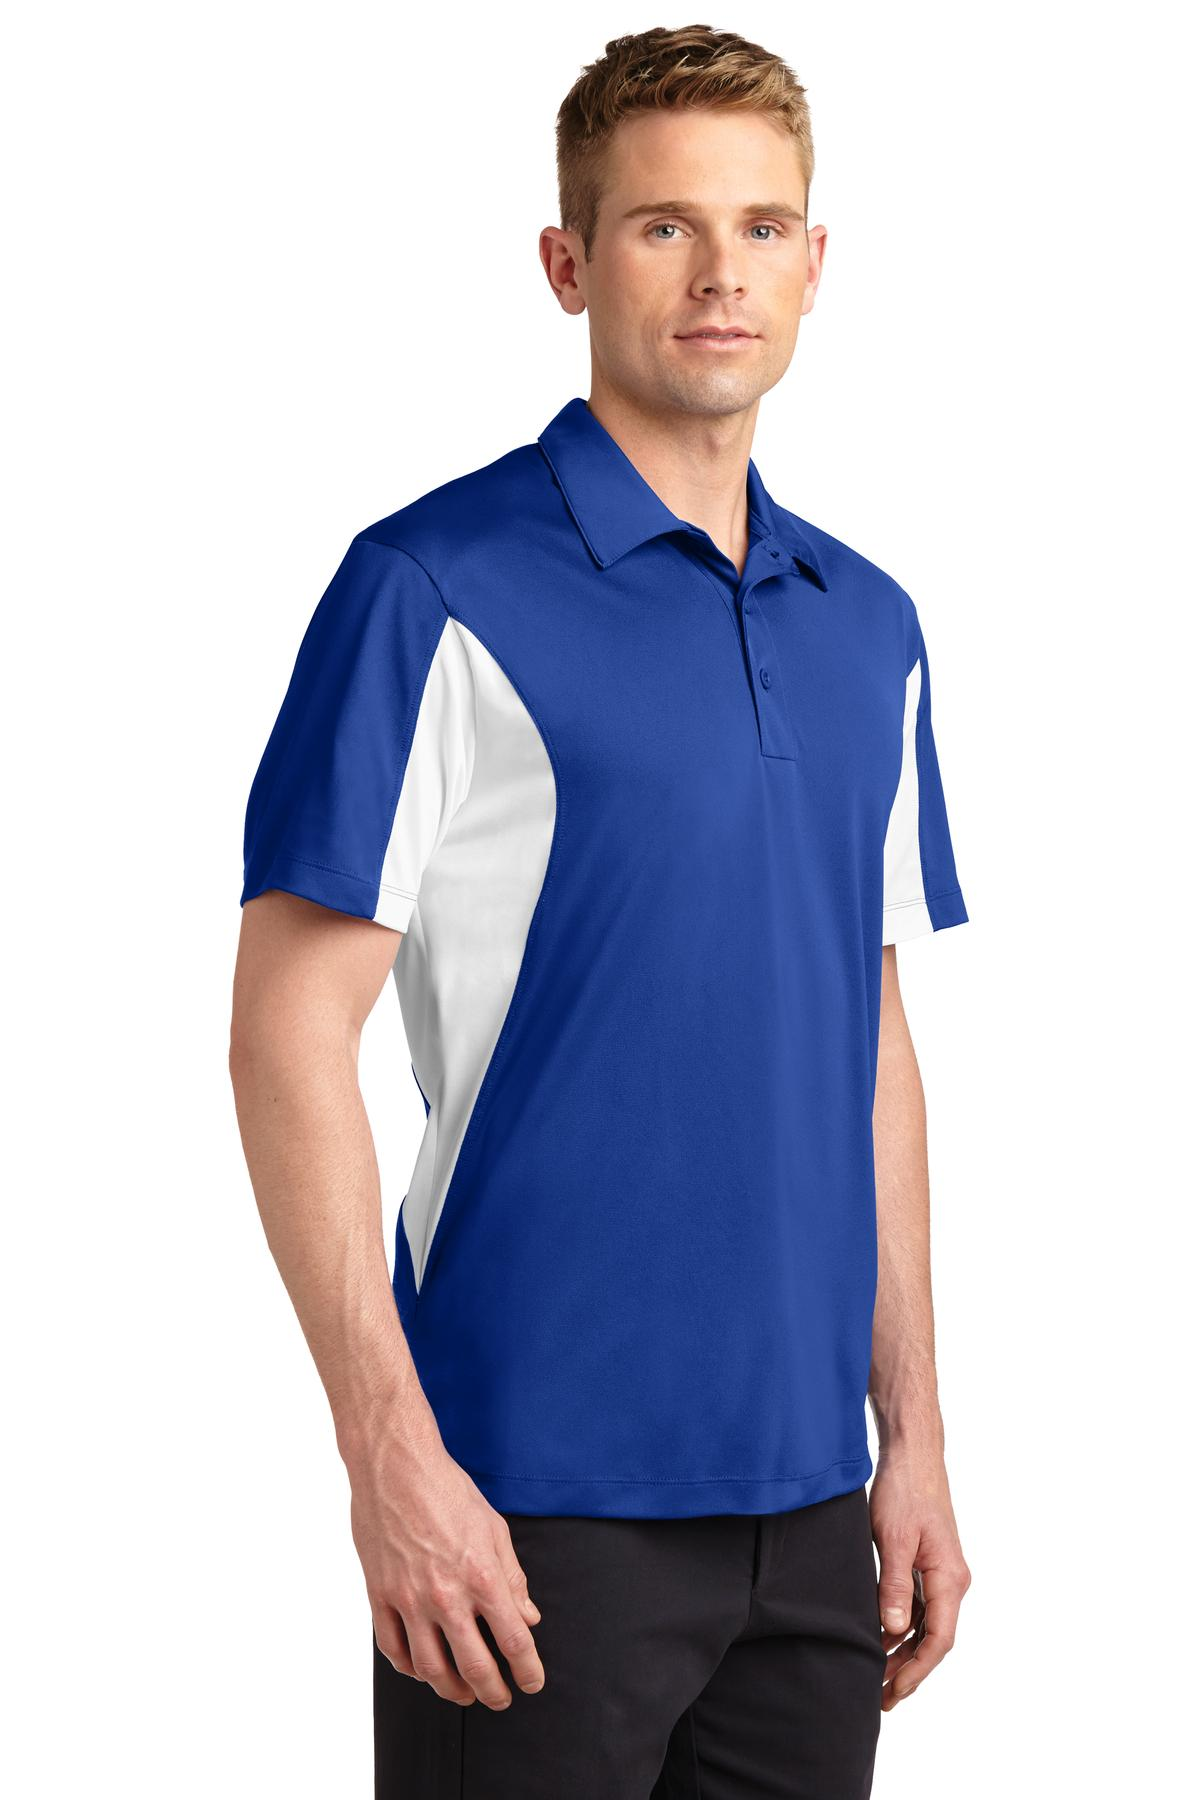 Mens Side Blocked Sport-Wick Sport Shirt - RCG1120